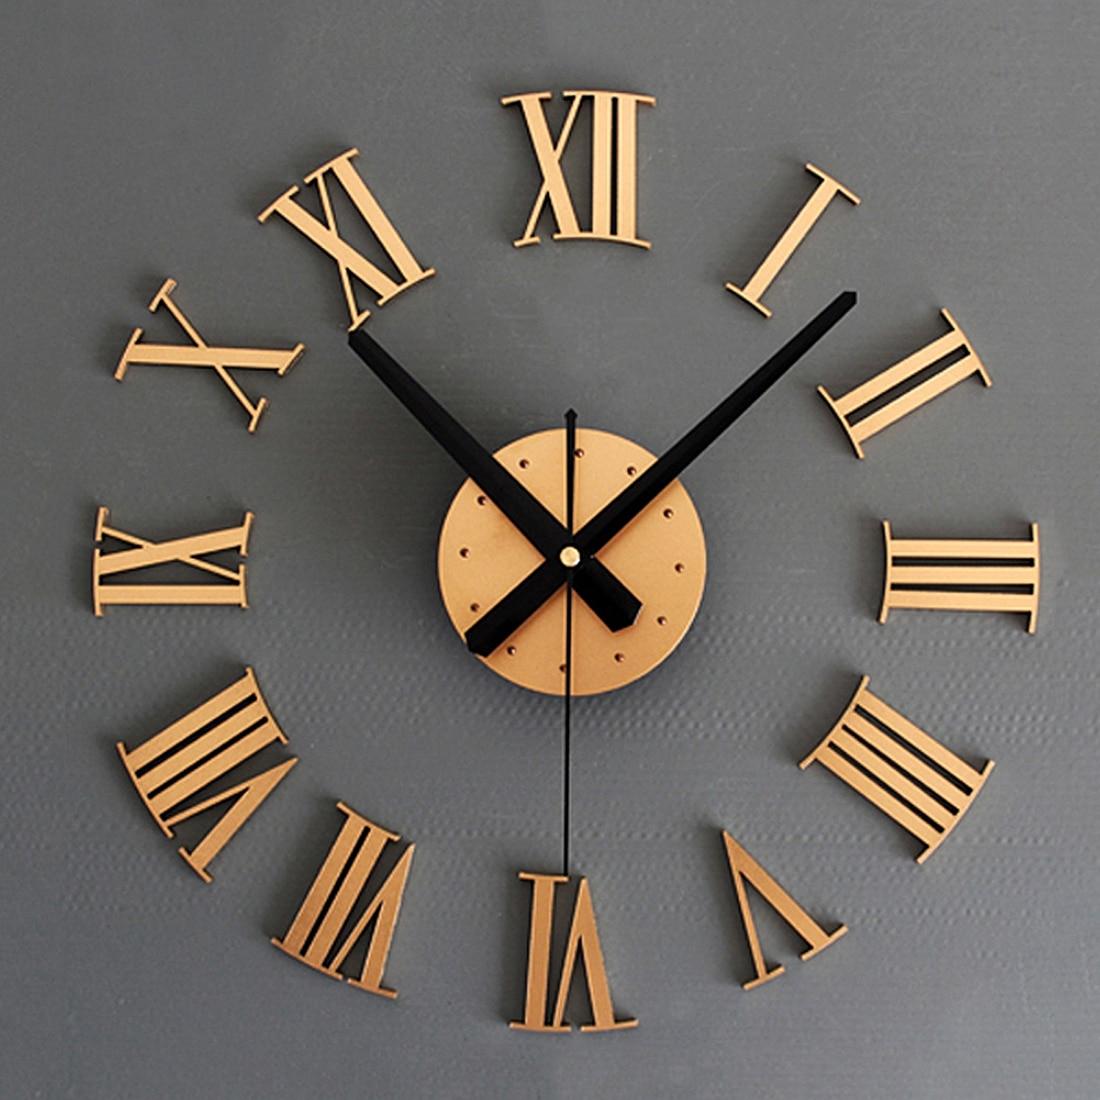 SZS Hot DIY Luxury 3D Roman Numerals Wall Clock Large Size Home Decoration Art Clock HOT (color:gold)